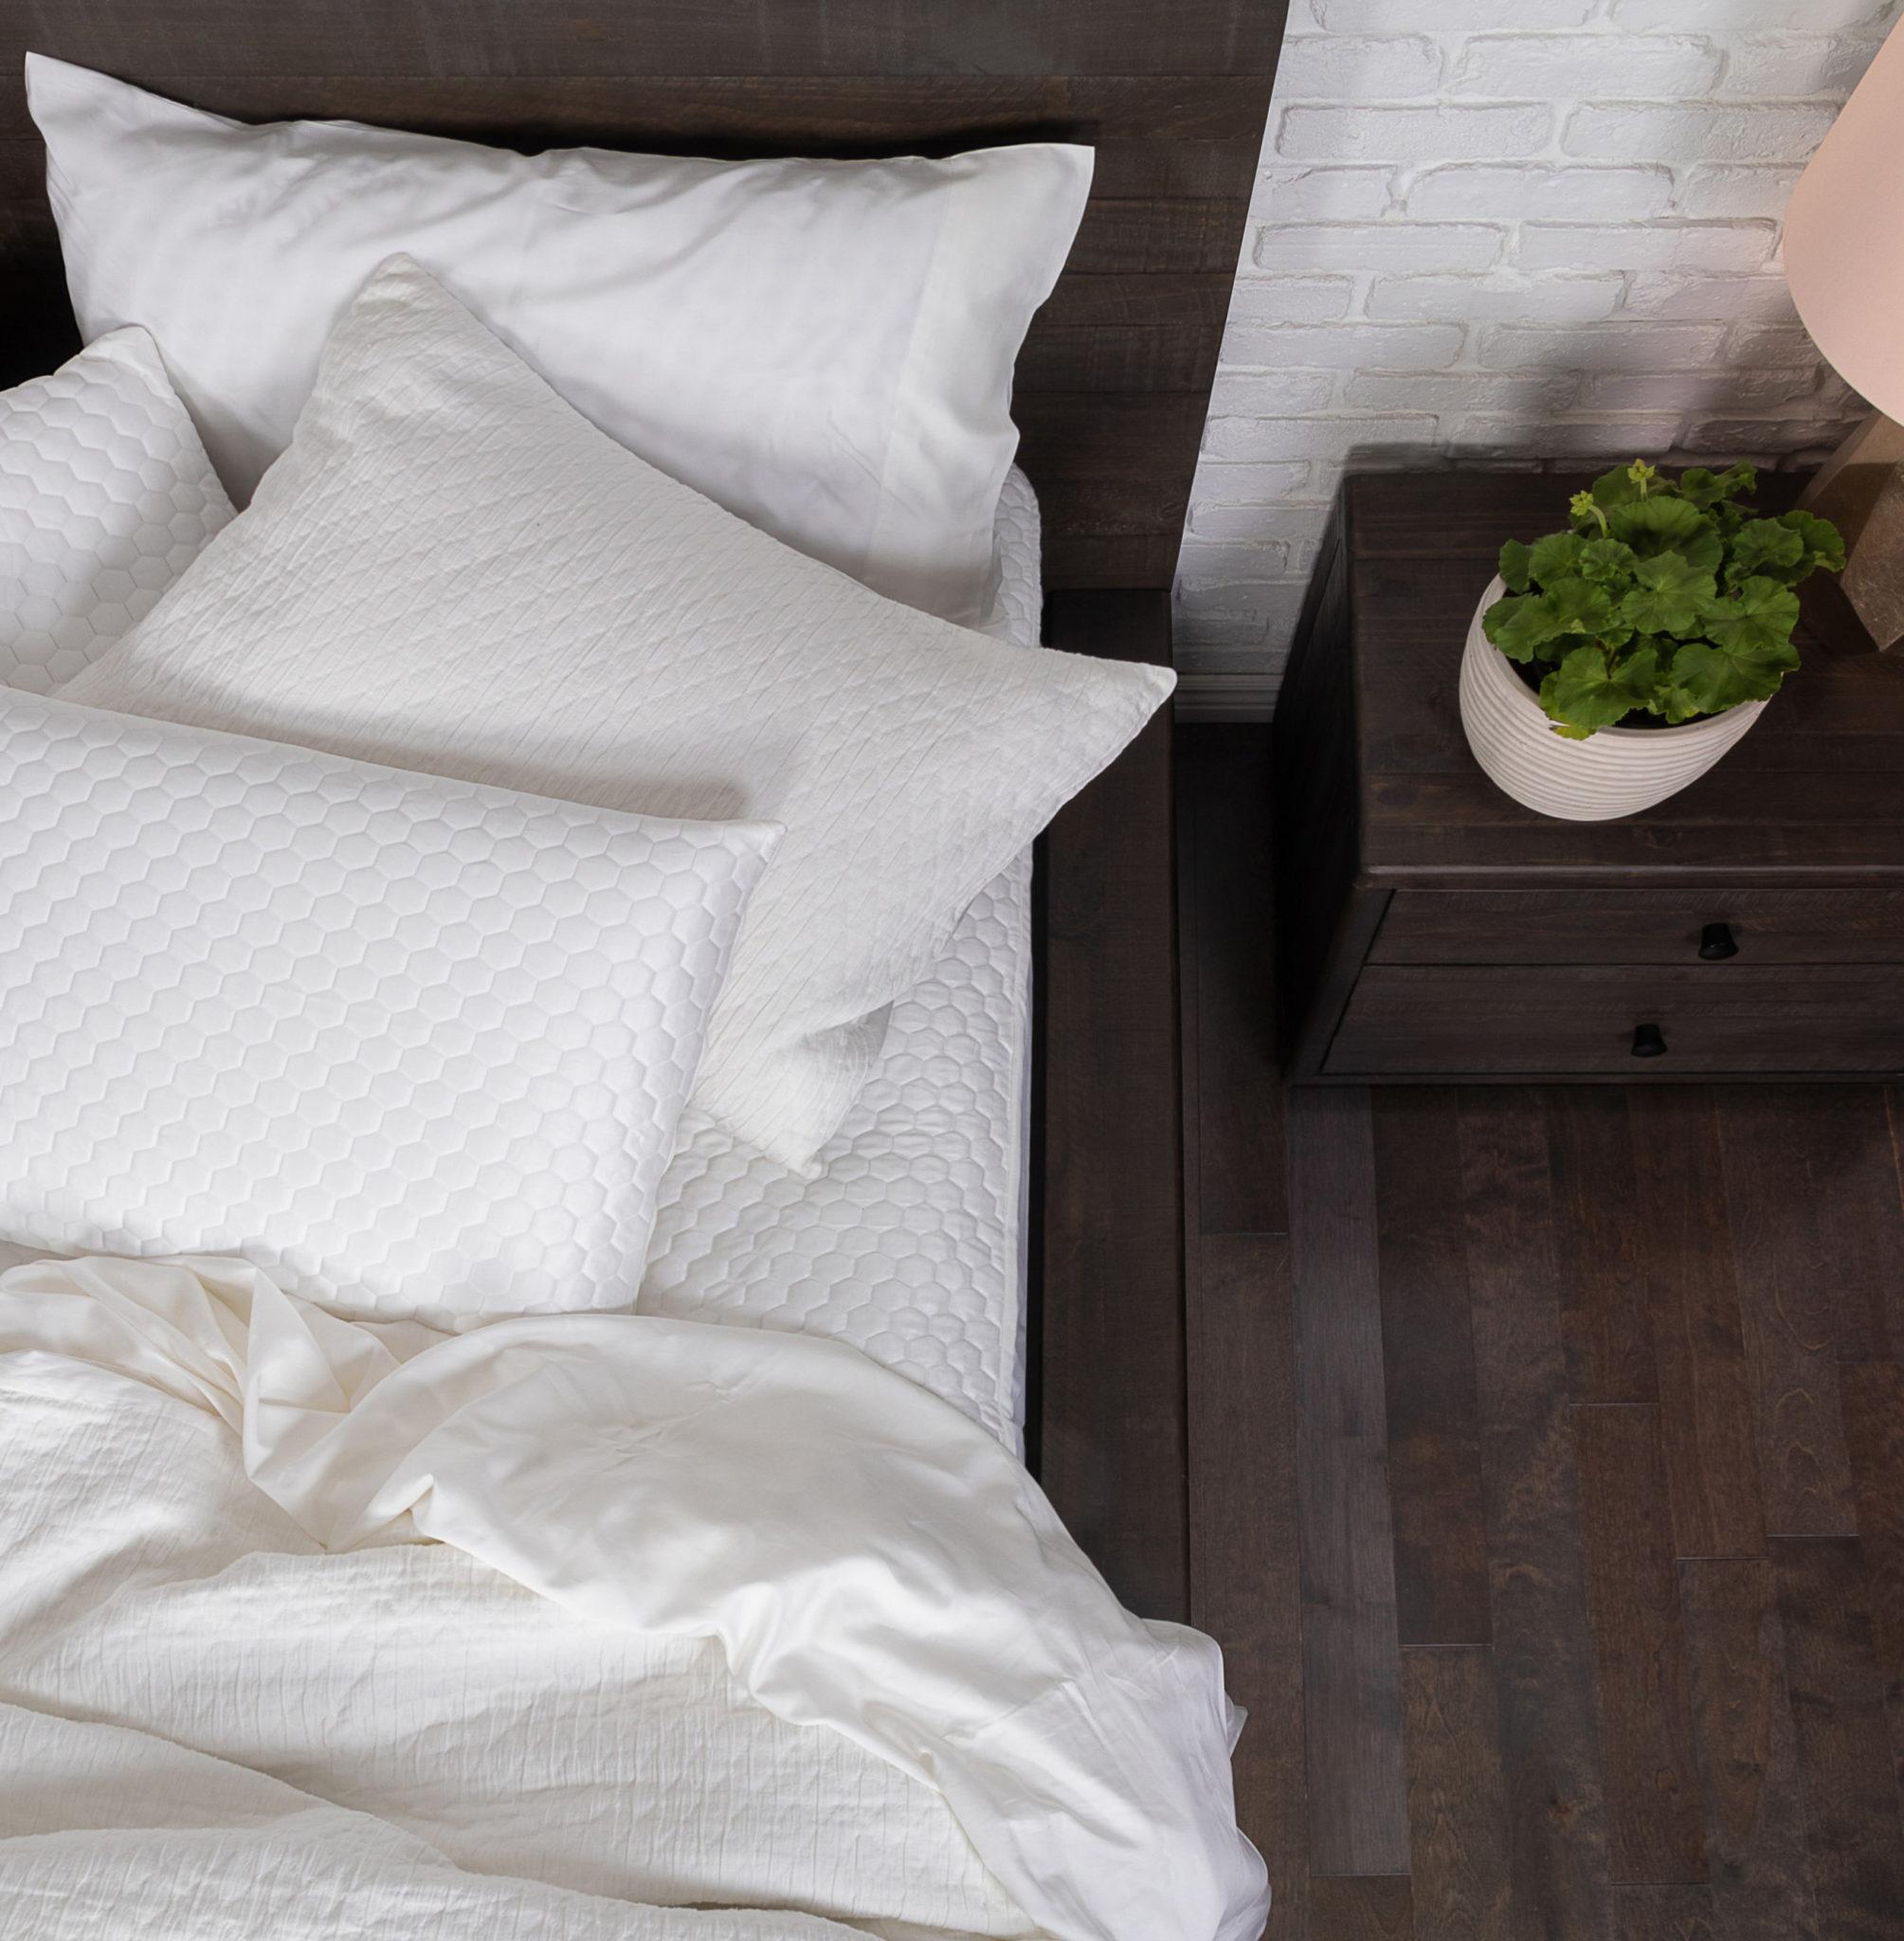 brooklyn bedding luxury cooling mattress protector